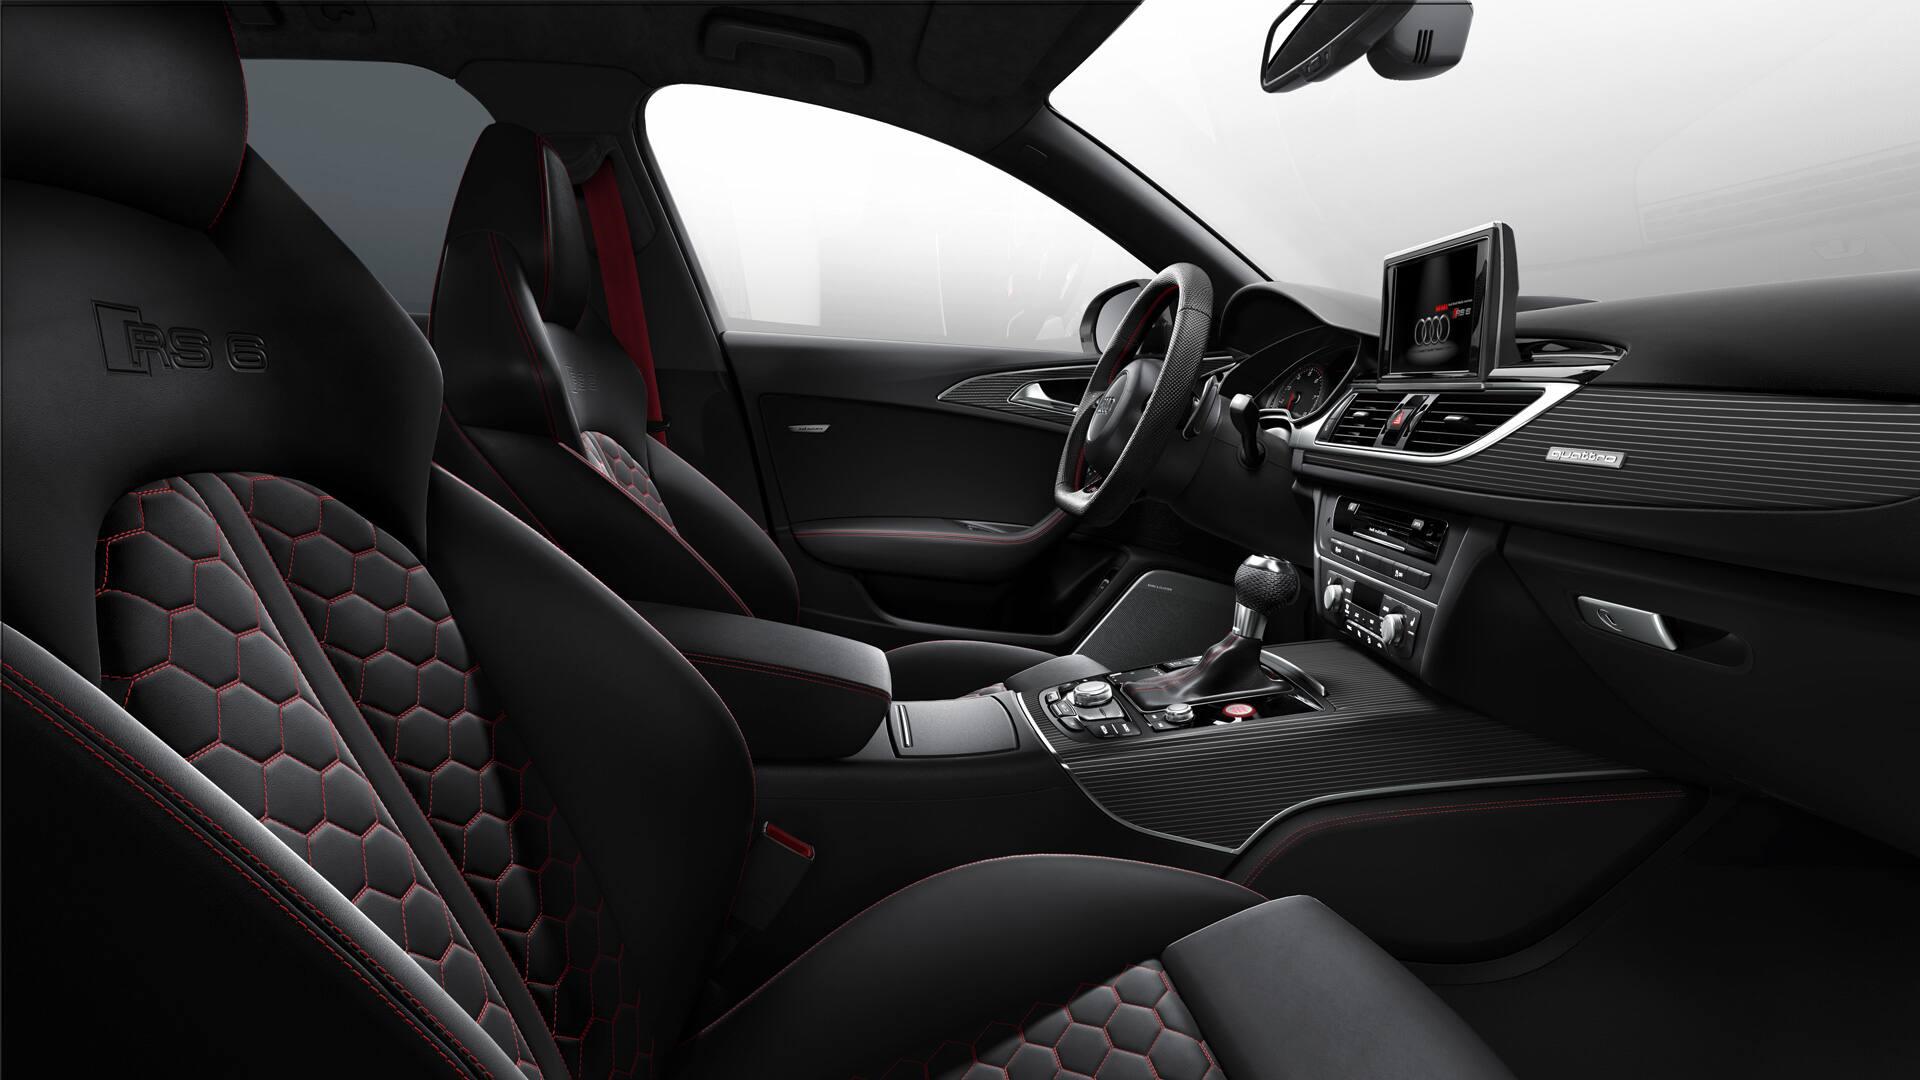 Rs 6 Avant A6 Audi Deutschland